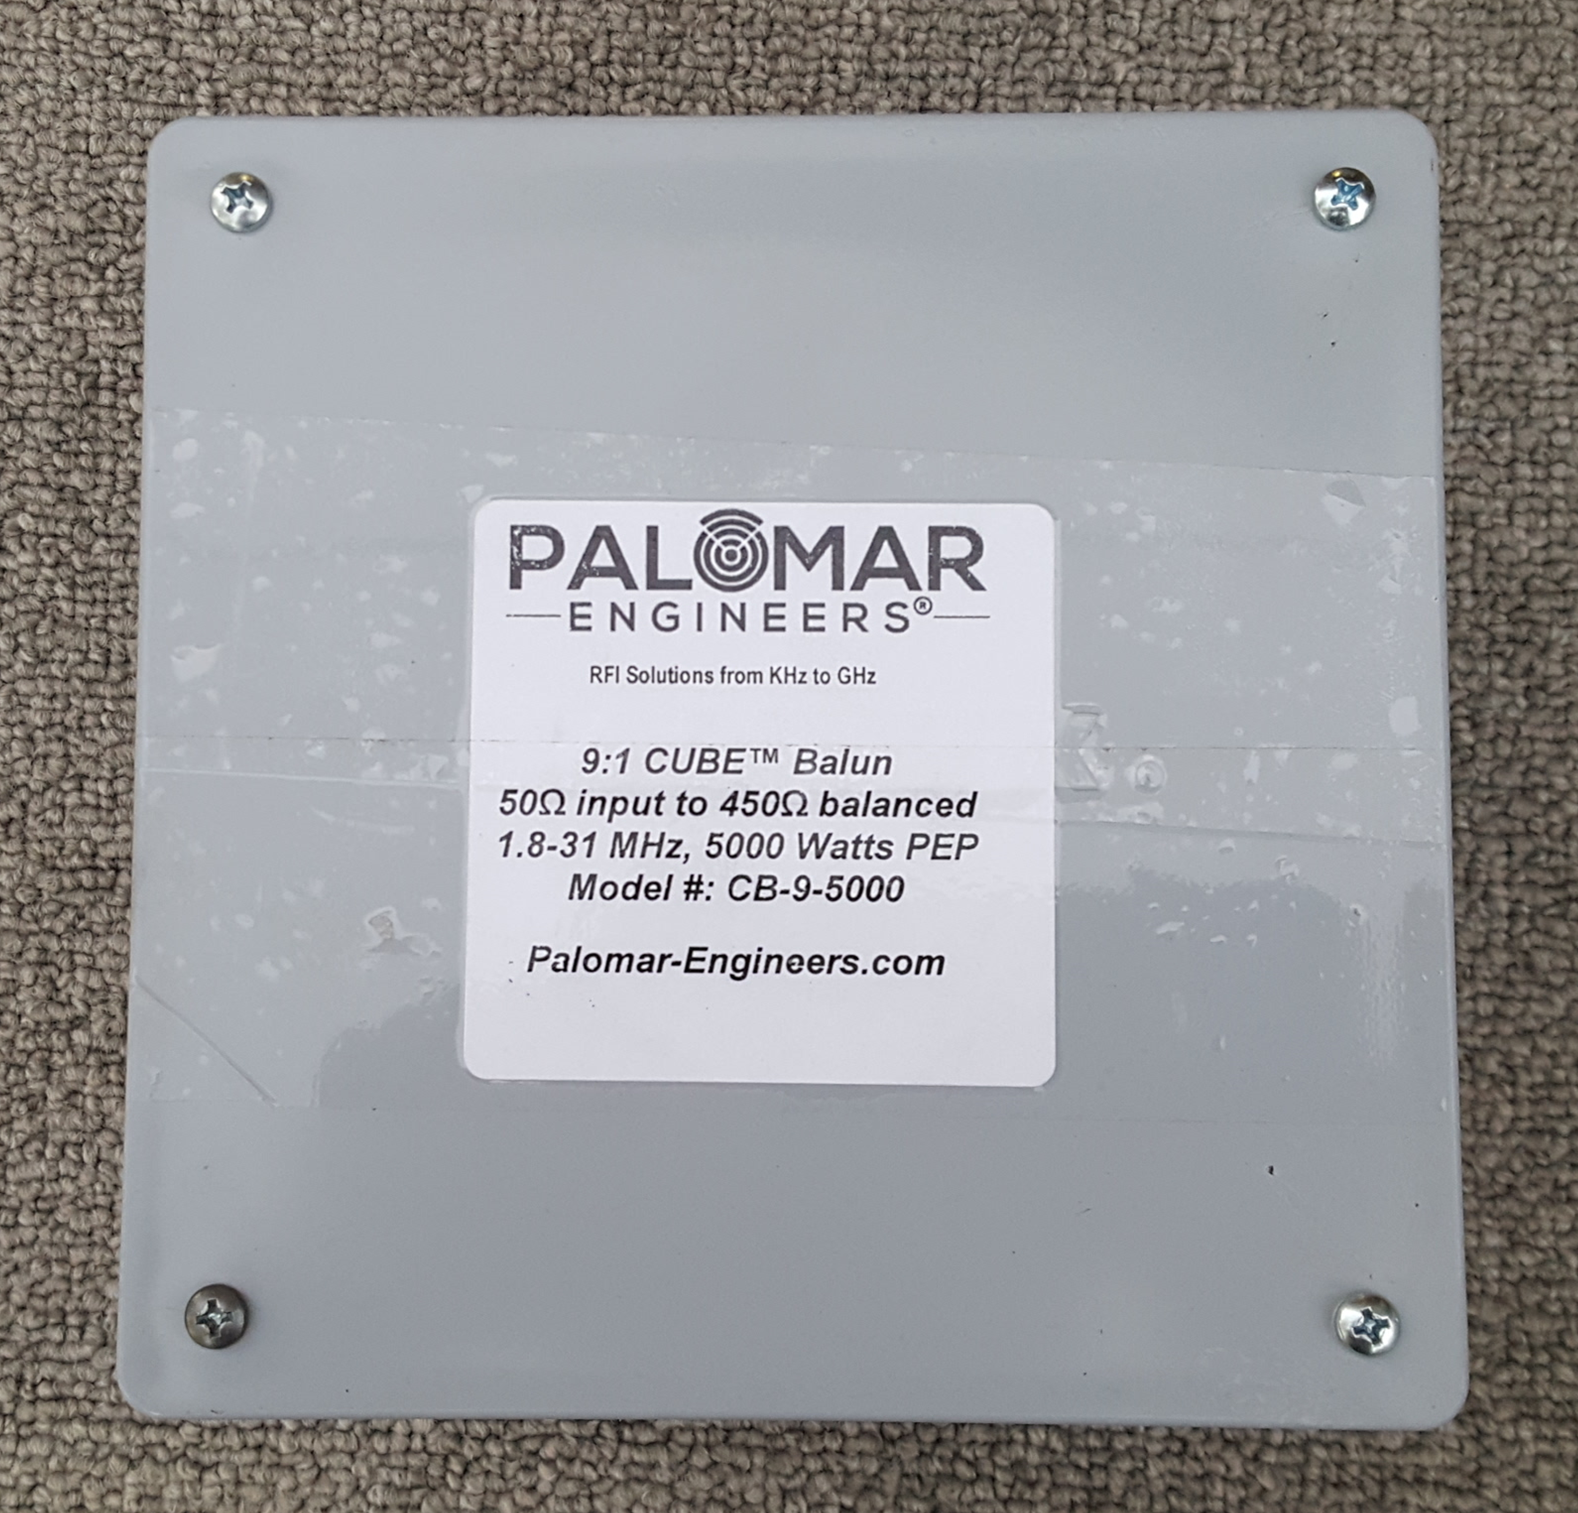 50:450 ohm (9:1) CUBE™ Balun, 1.8-31 MHz, 5 KW, ladder line, ZEPP, T2FD CB-9-5000